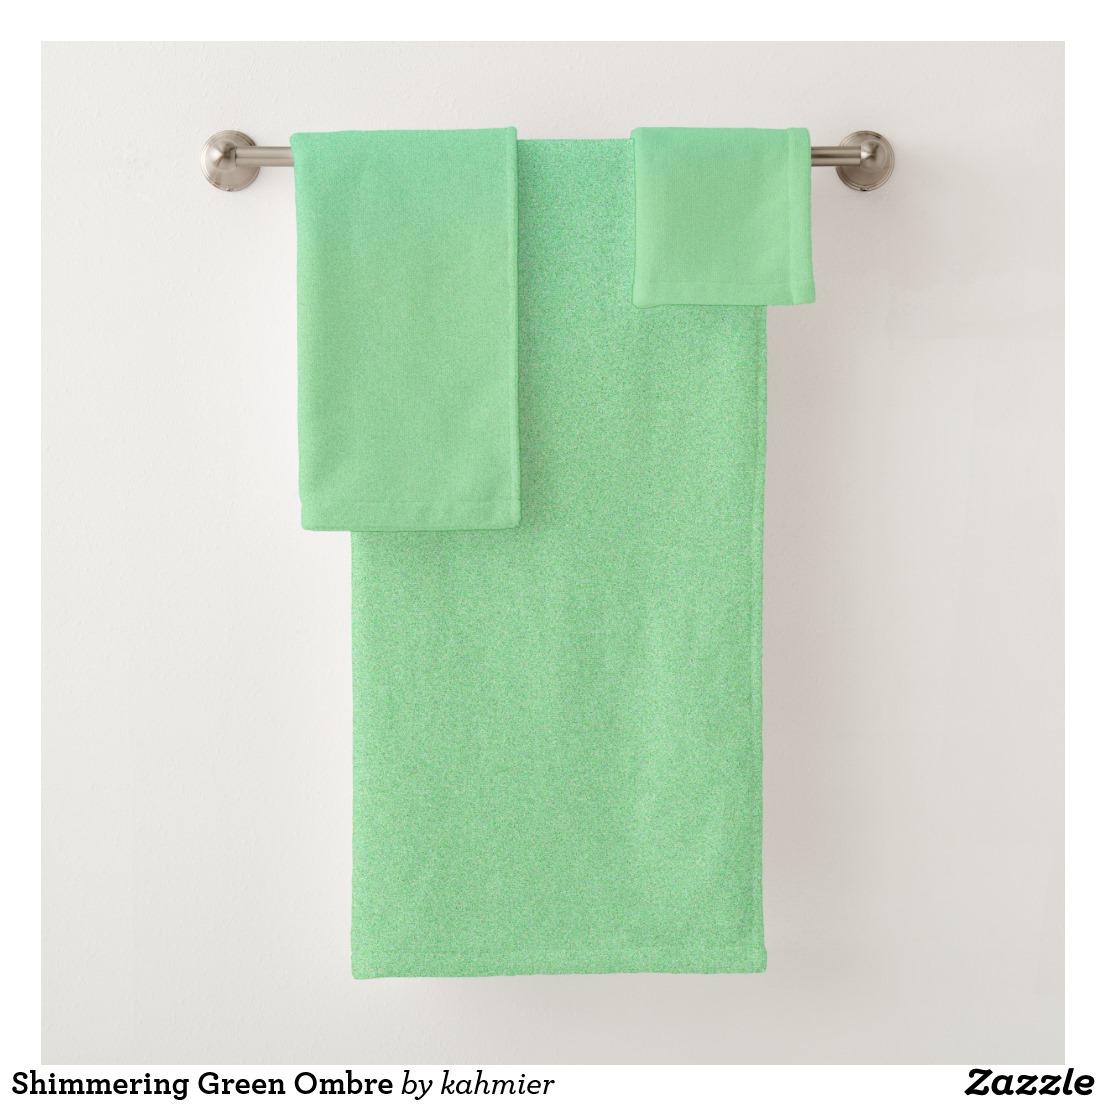 Shimmering Green Ombre Bath Towel Set